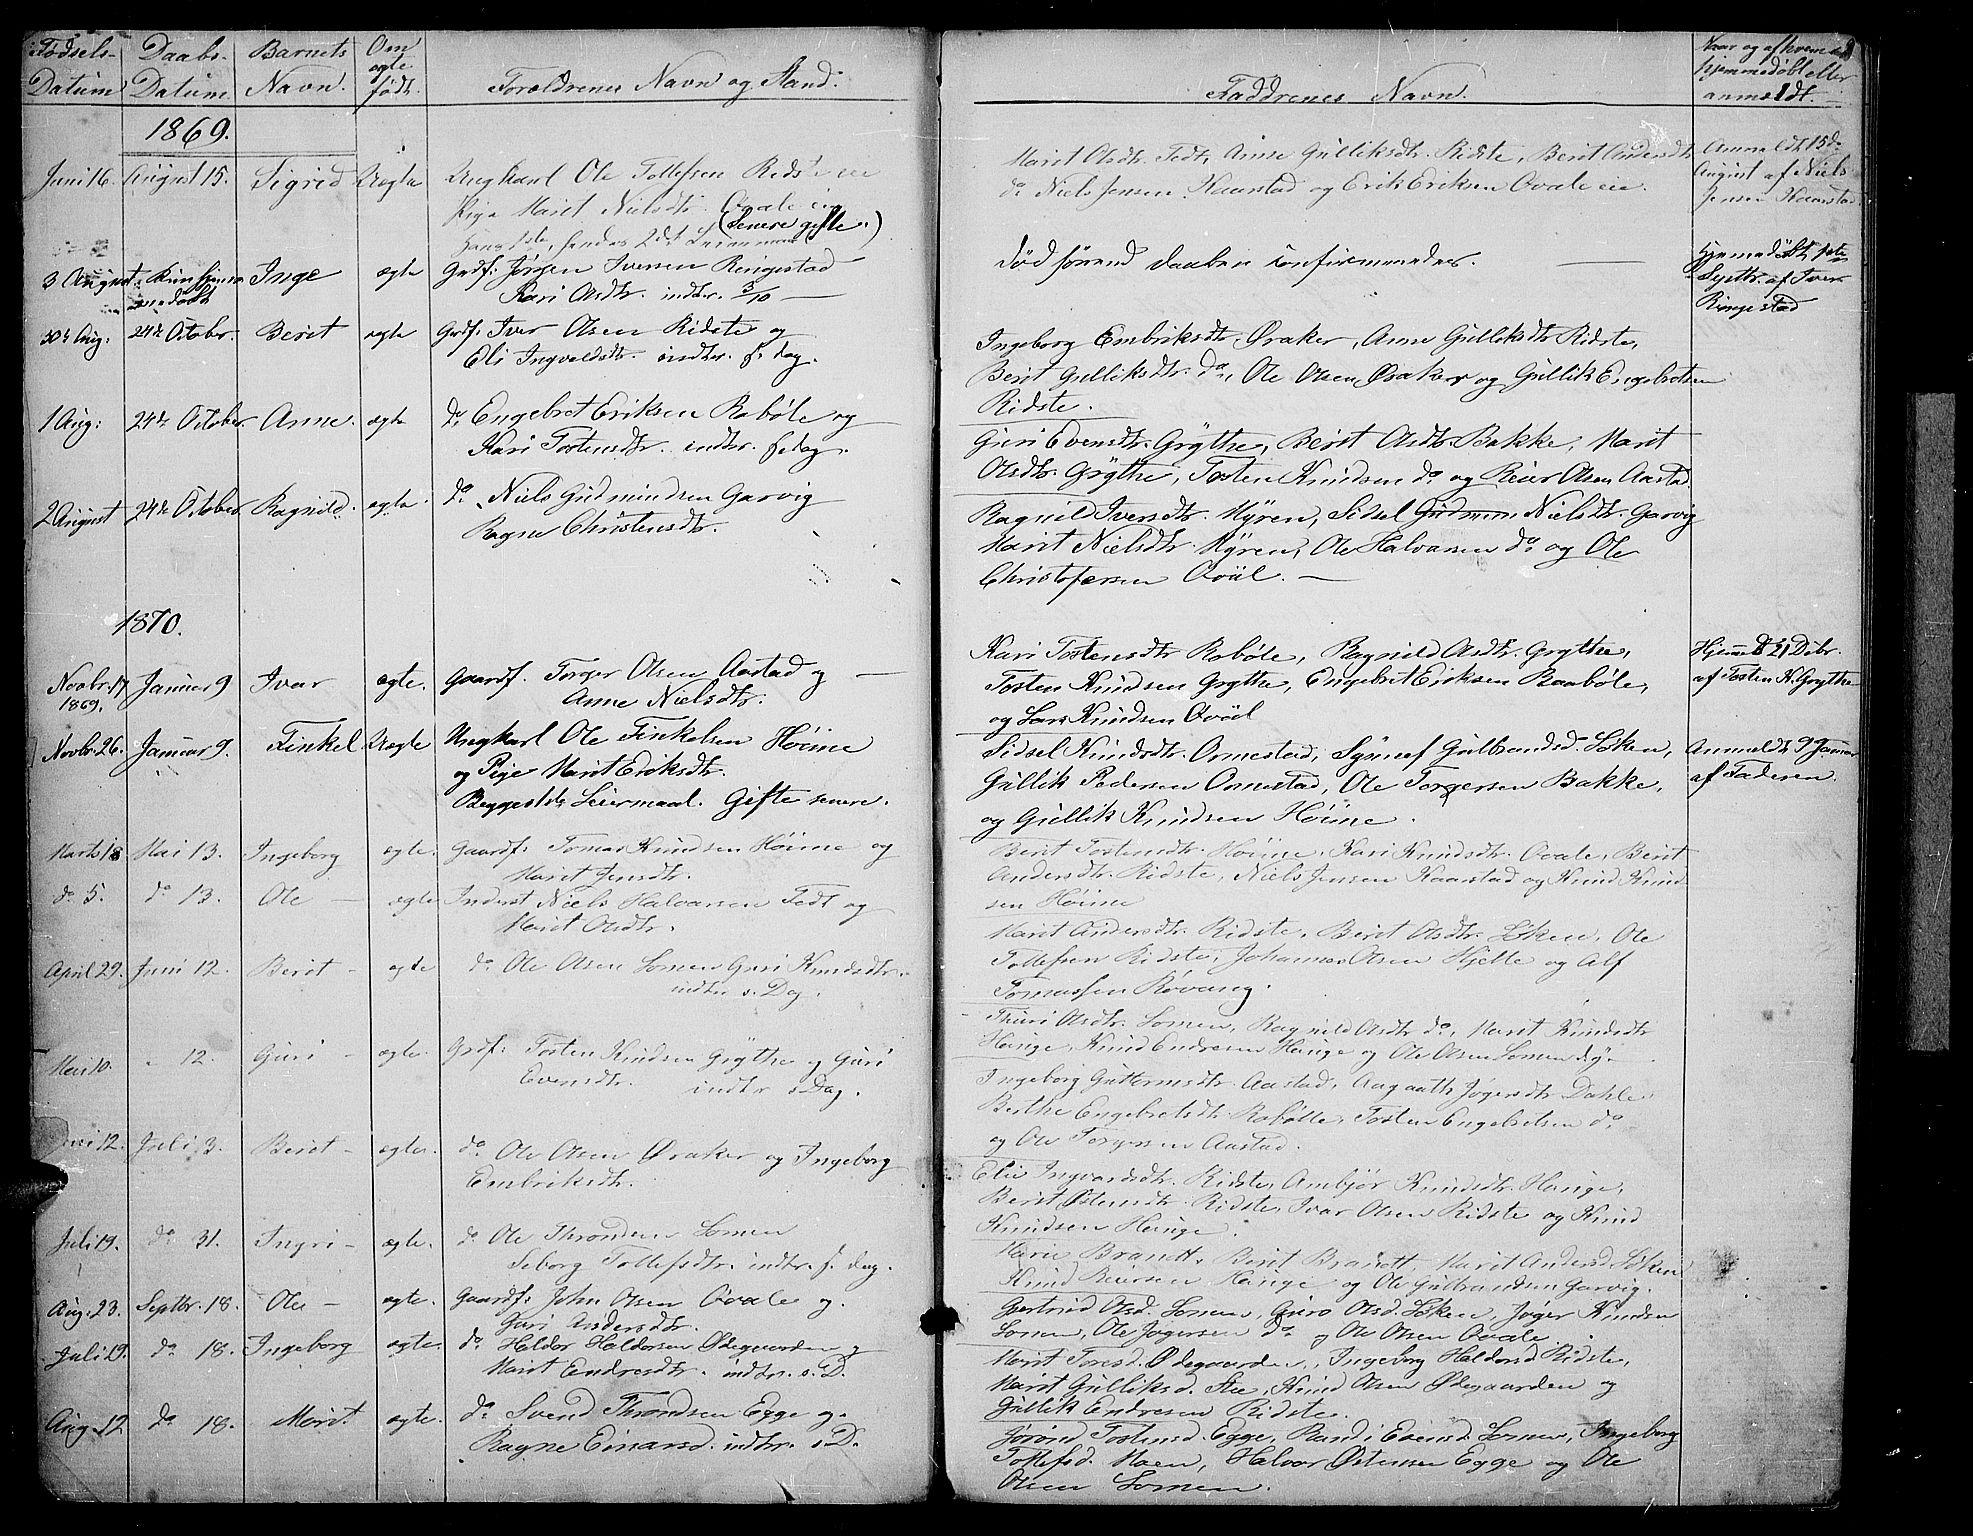 SAH, Vestre Slidre prestekontor, Klokkerbok nr. 2, 1869-1882, s. 2